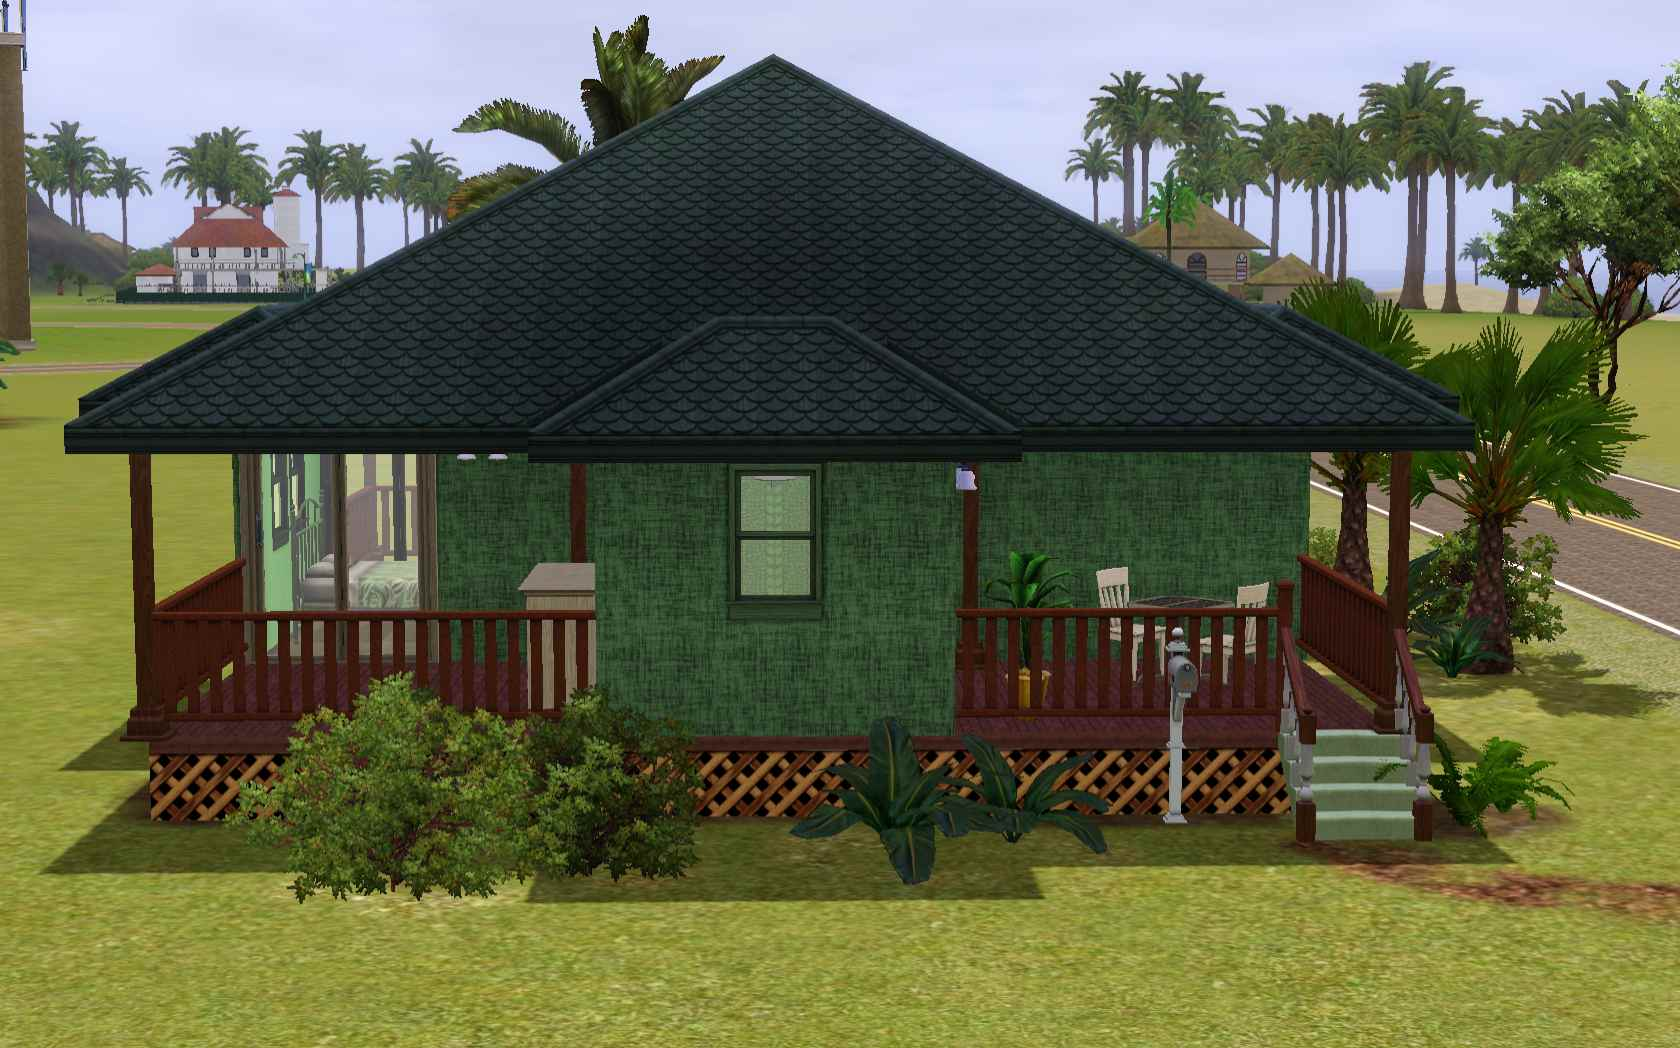 Mod The Sims - Turtle Shell Pole House - Base Game & No CC